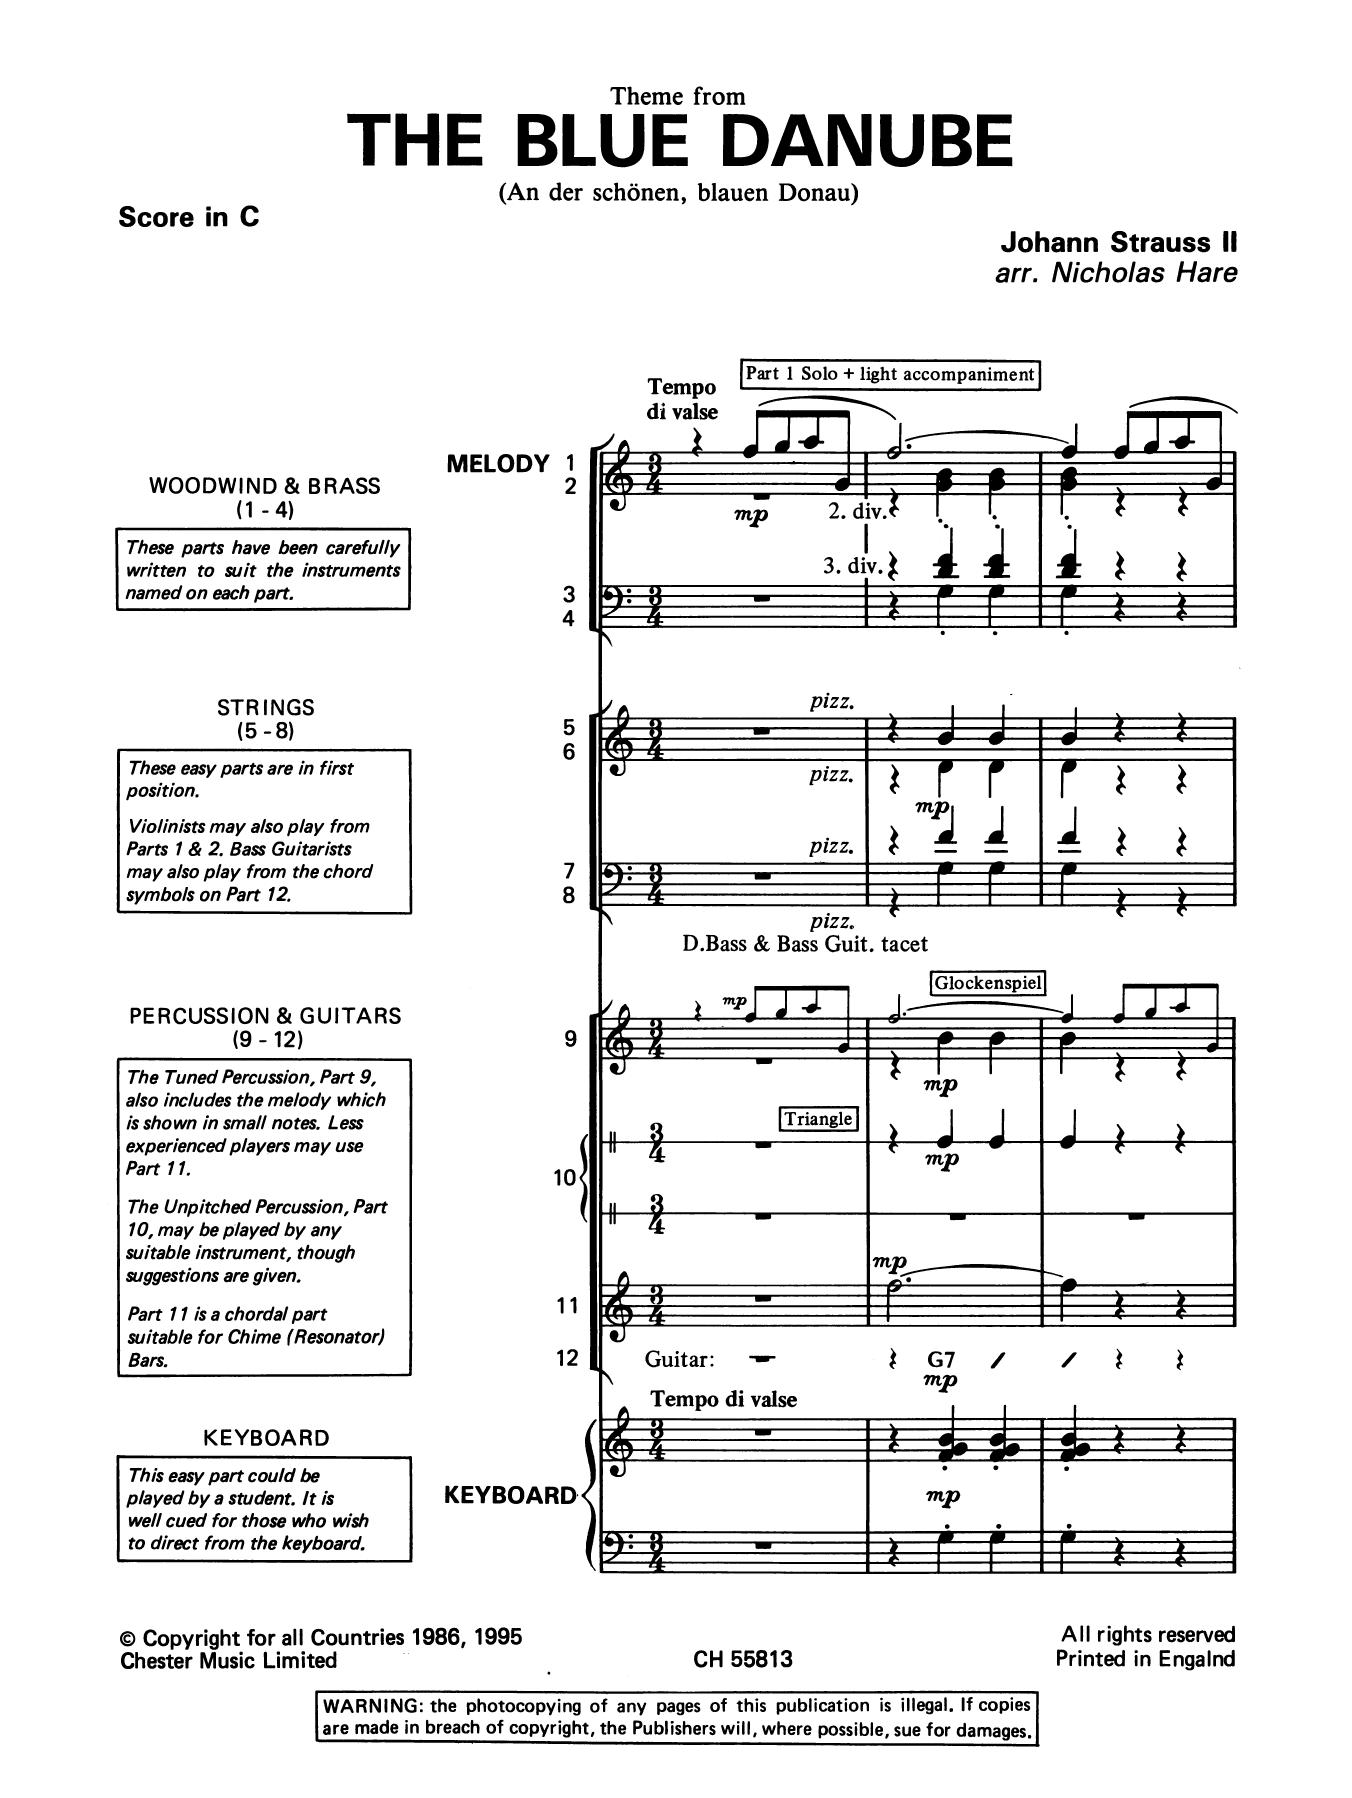 Johann Strauss II: (On The Beautiful) The Blue Danube